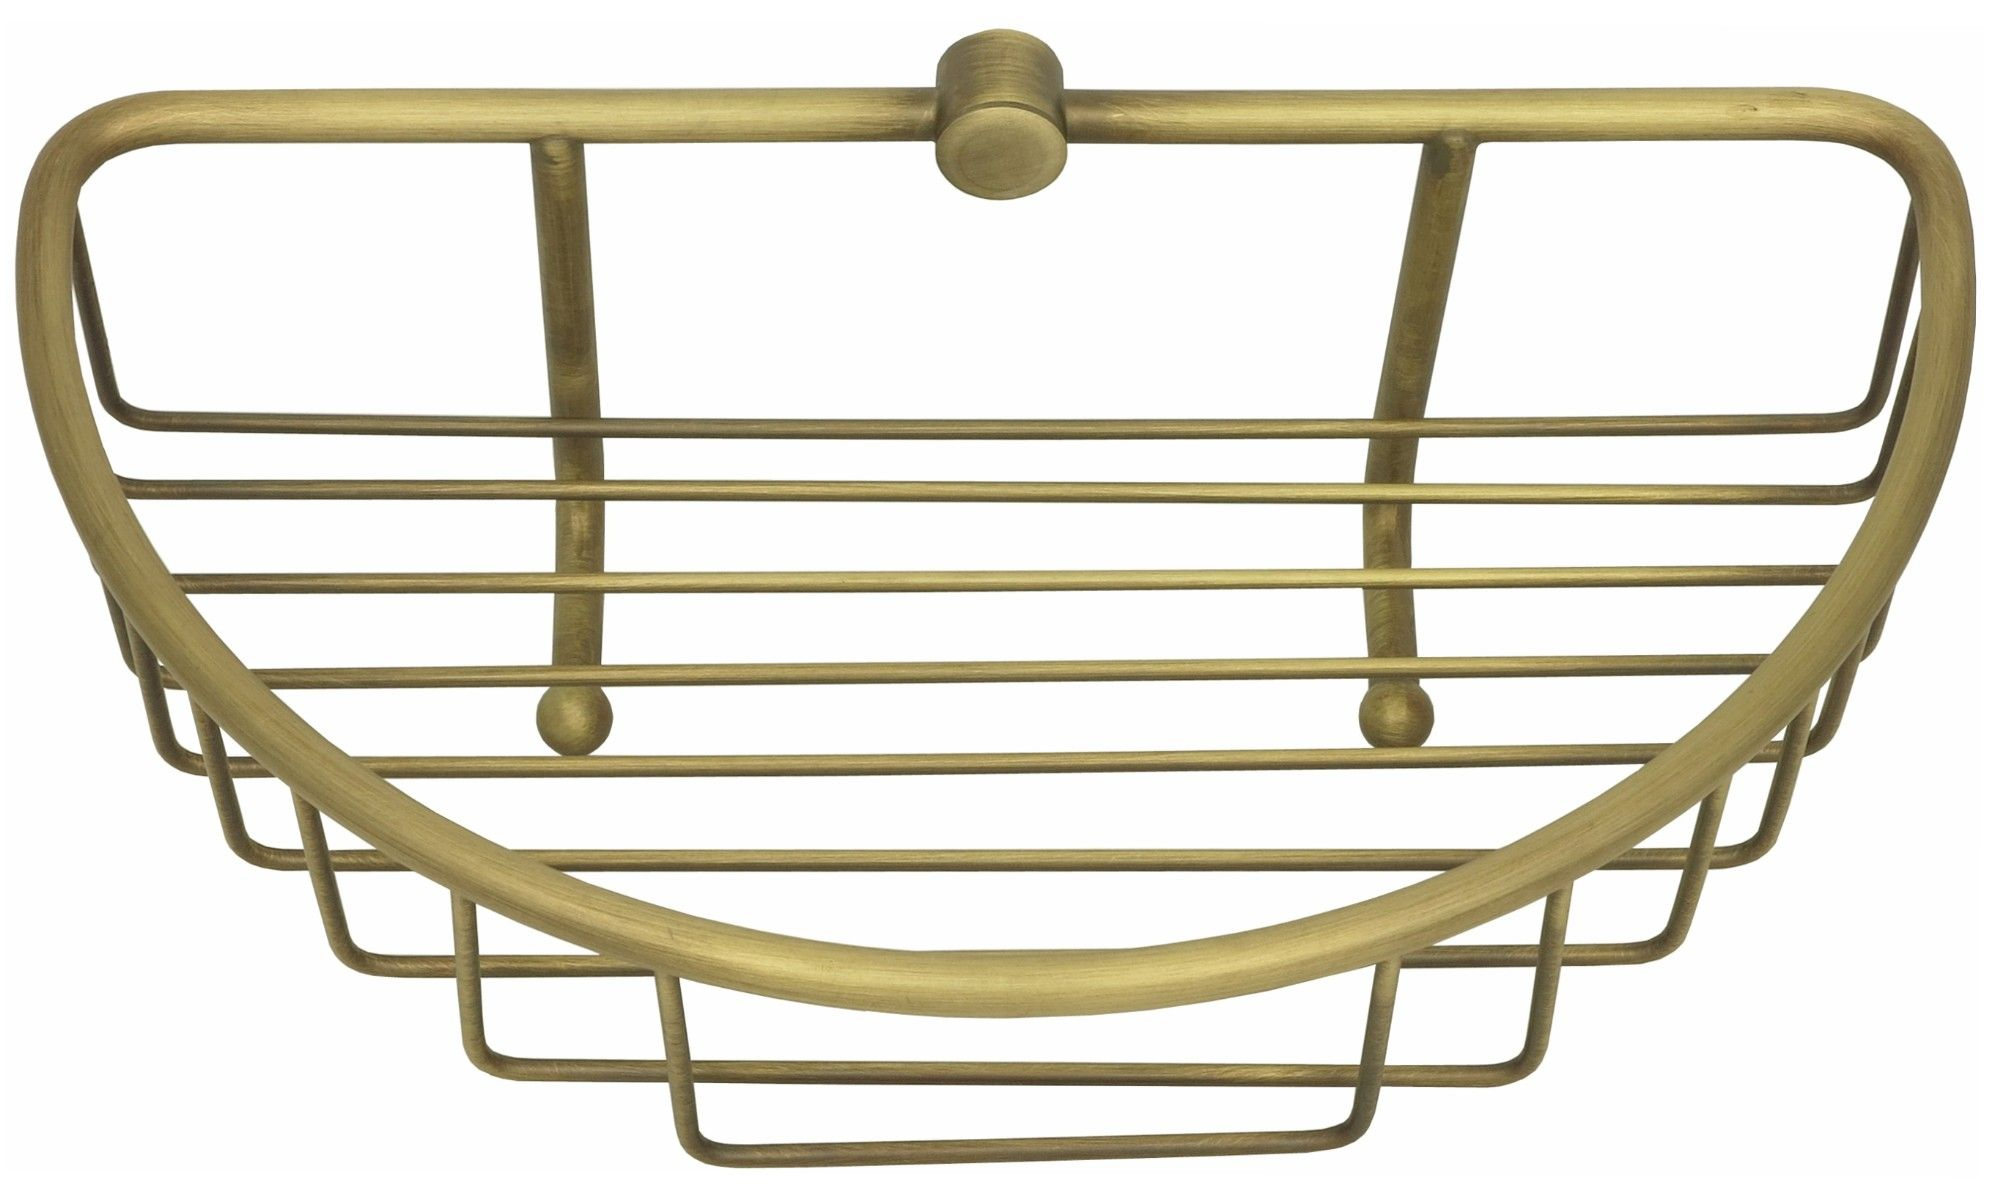 duschregal duschkorb duschablage h ngeregal bad regal korb ablage dusche antik ebay. Black Bedroom Furniture Sets. Home Design Ideas